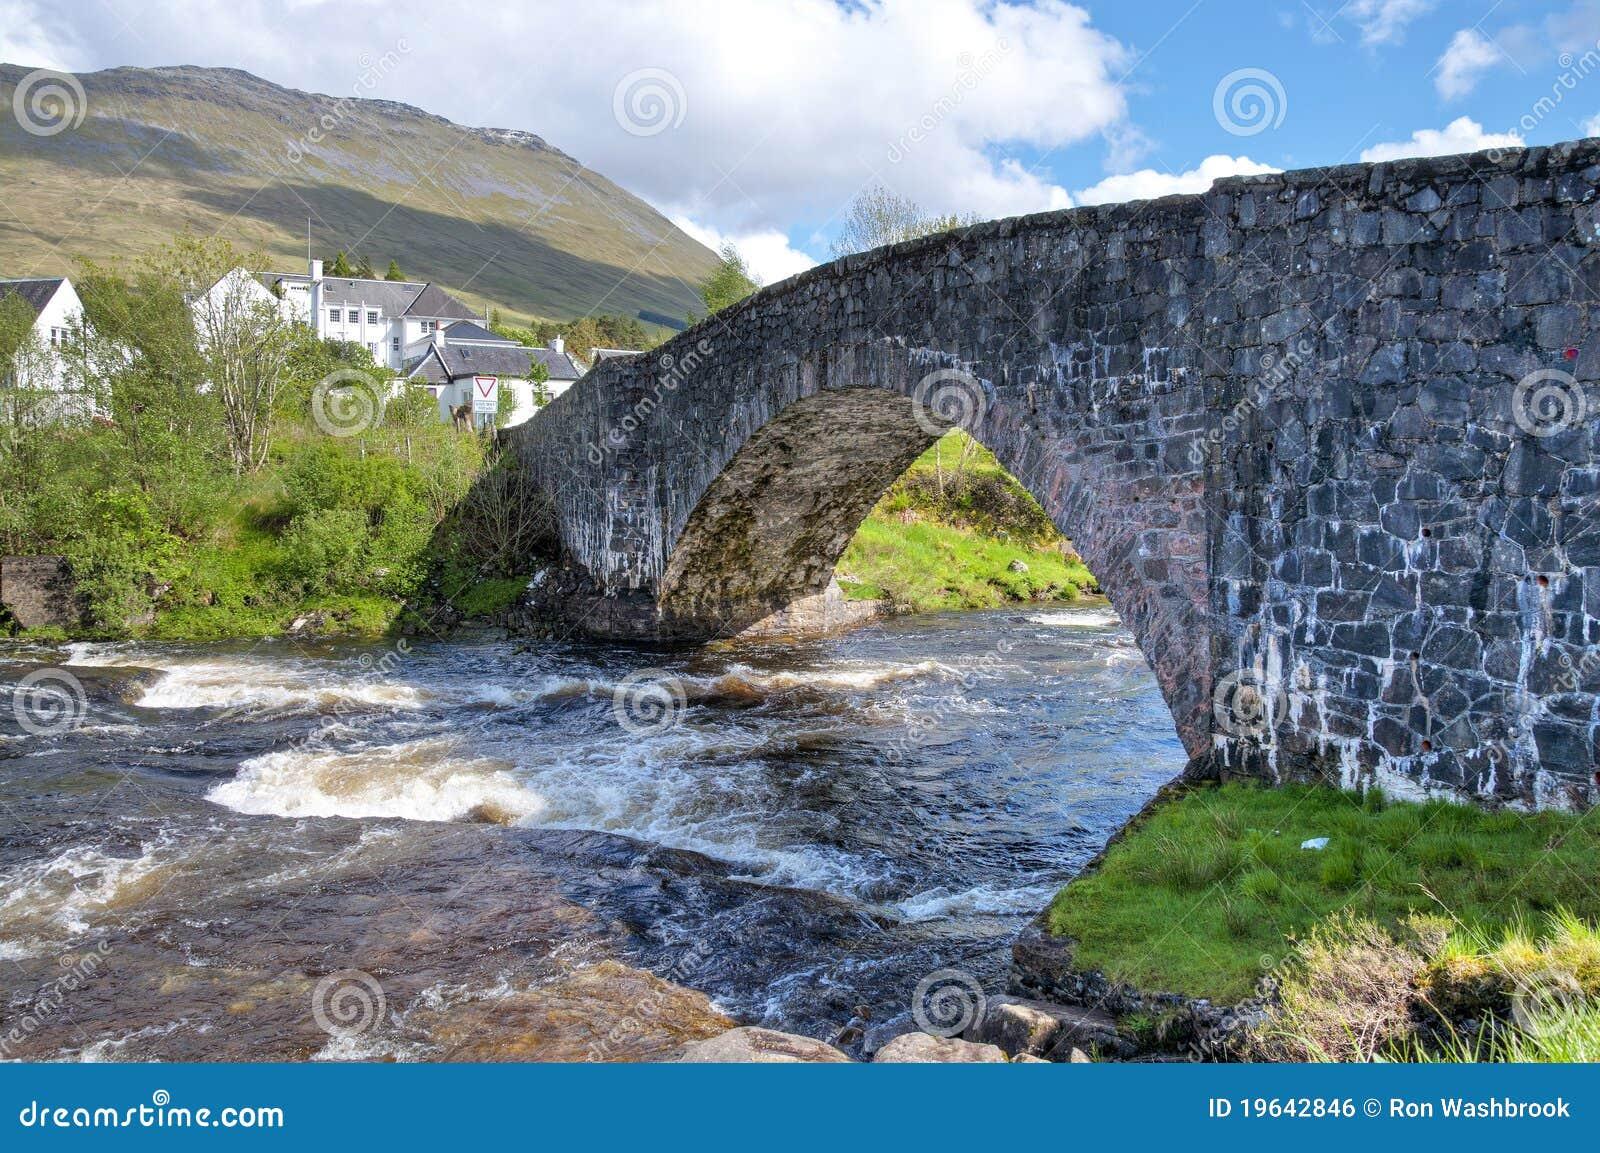 Bridge of Orchy Scotland